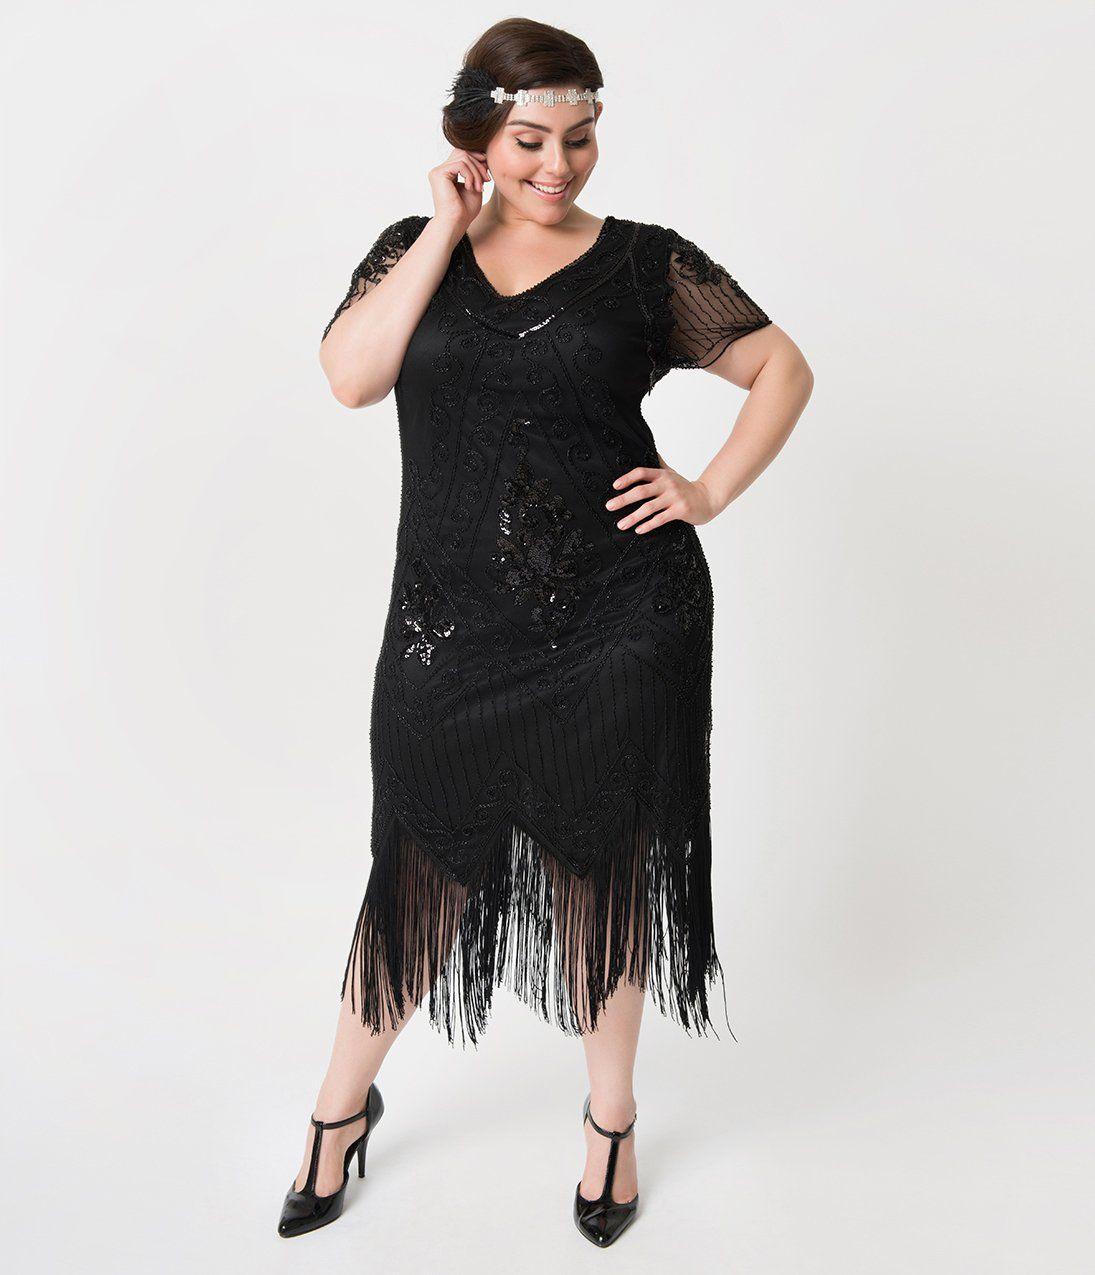 1920s Plus Size Flapper Dresses Gatsby Dresses Flapper Costumes Plus Size Flapper Dress Plus Size Flapper Costume Plus Size Cocktail Dresses [ 1275 x 1095 Pixel ]